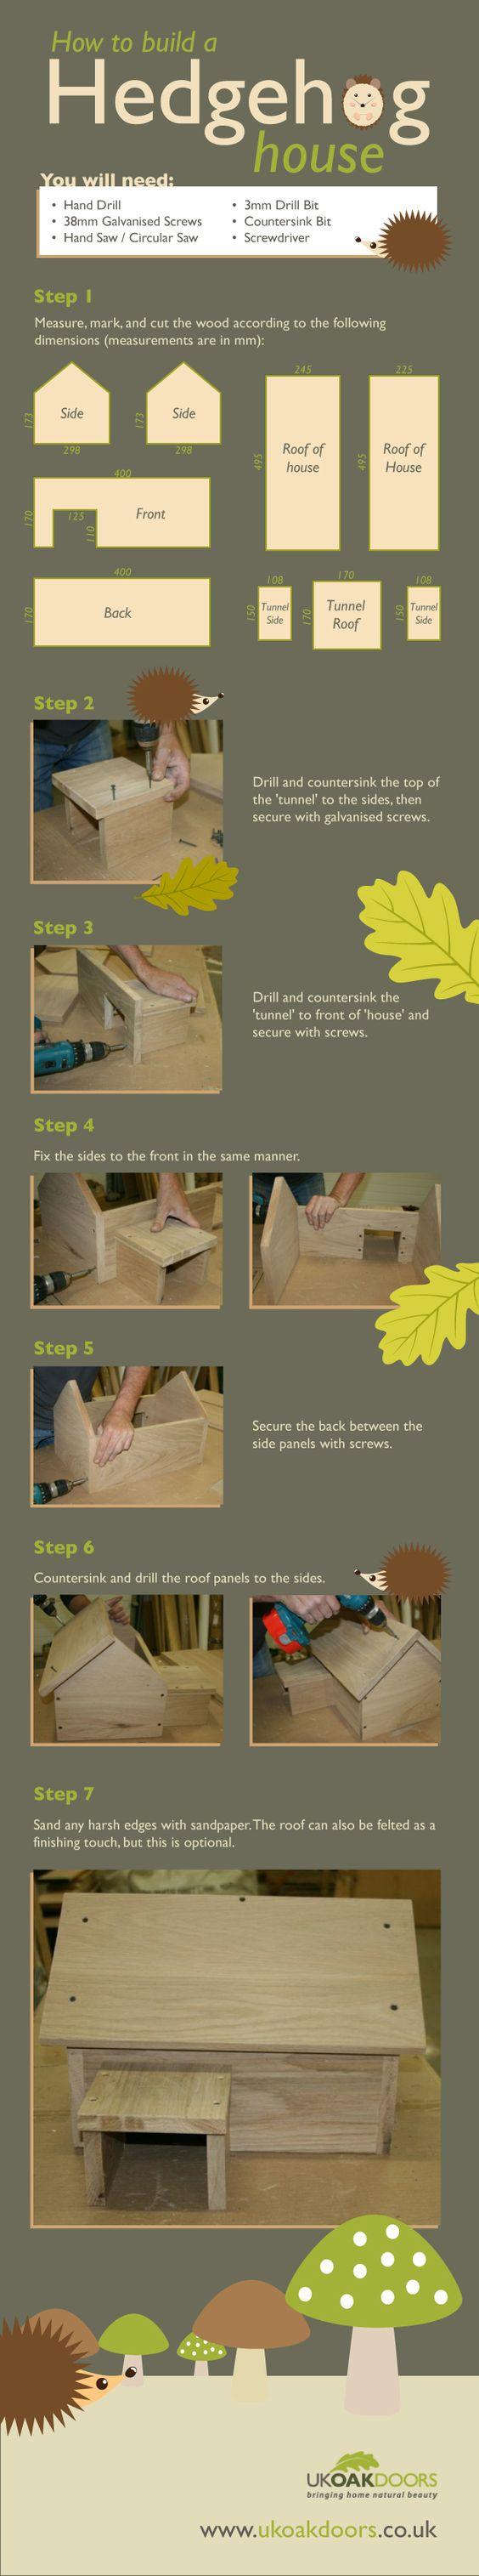 How to Build a Hedgehog House | UK Oak Doors Blog